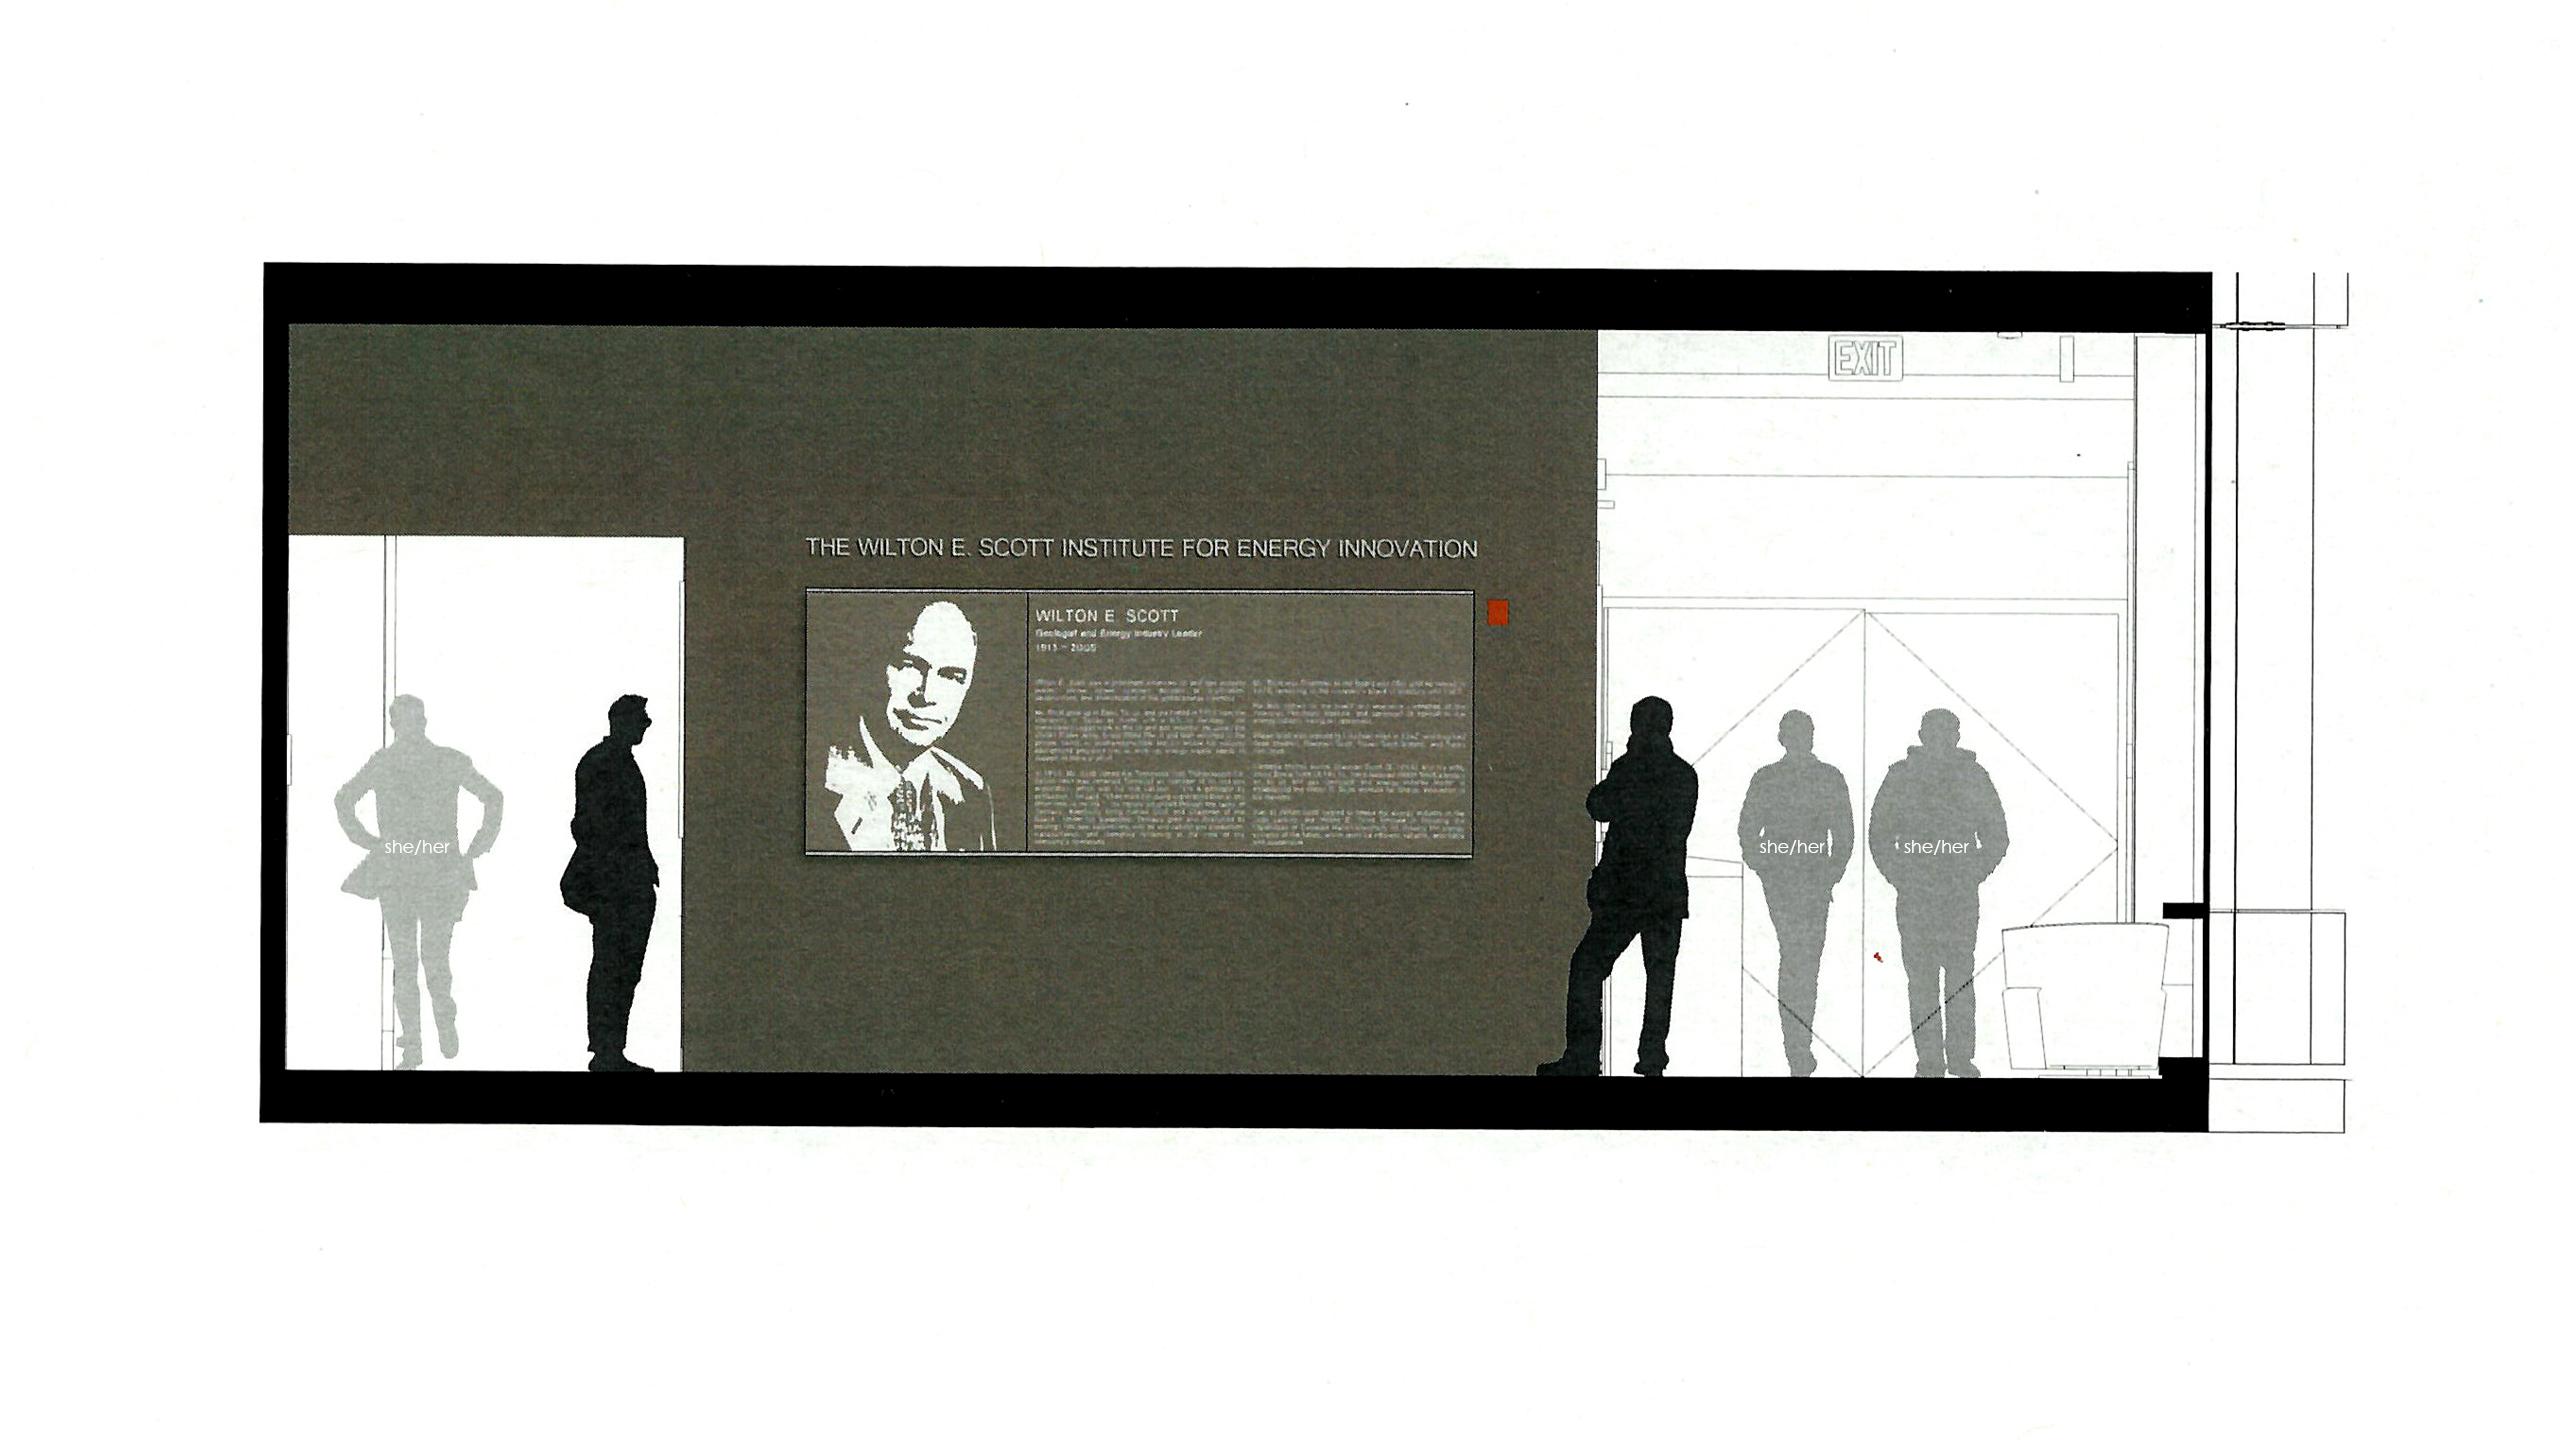 Storytelling, Artwork, Graphic and Display Design: Scott Hall at Carnegie Mellon University / image 9